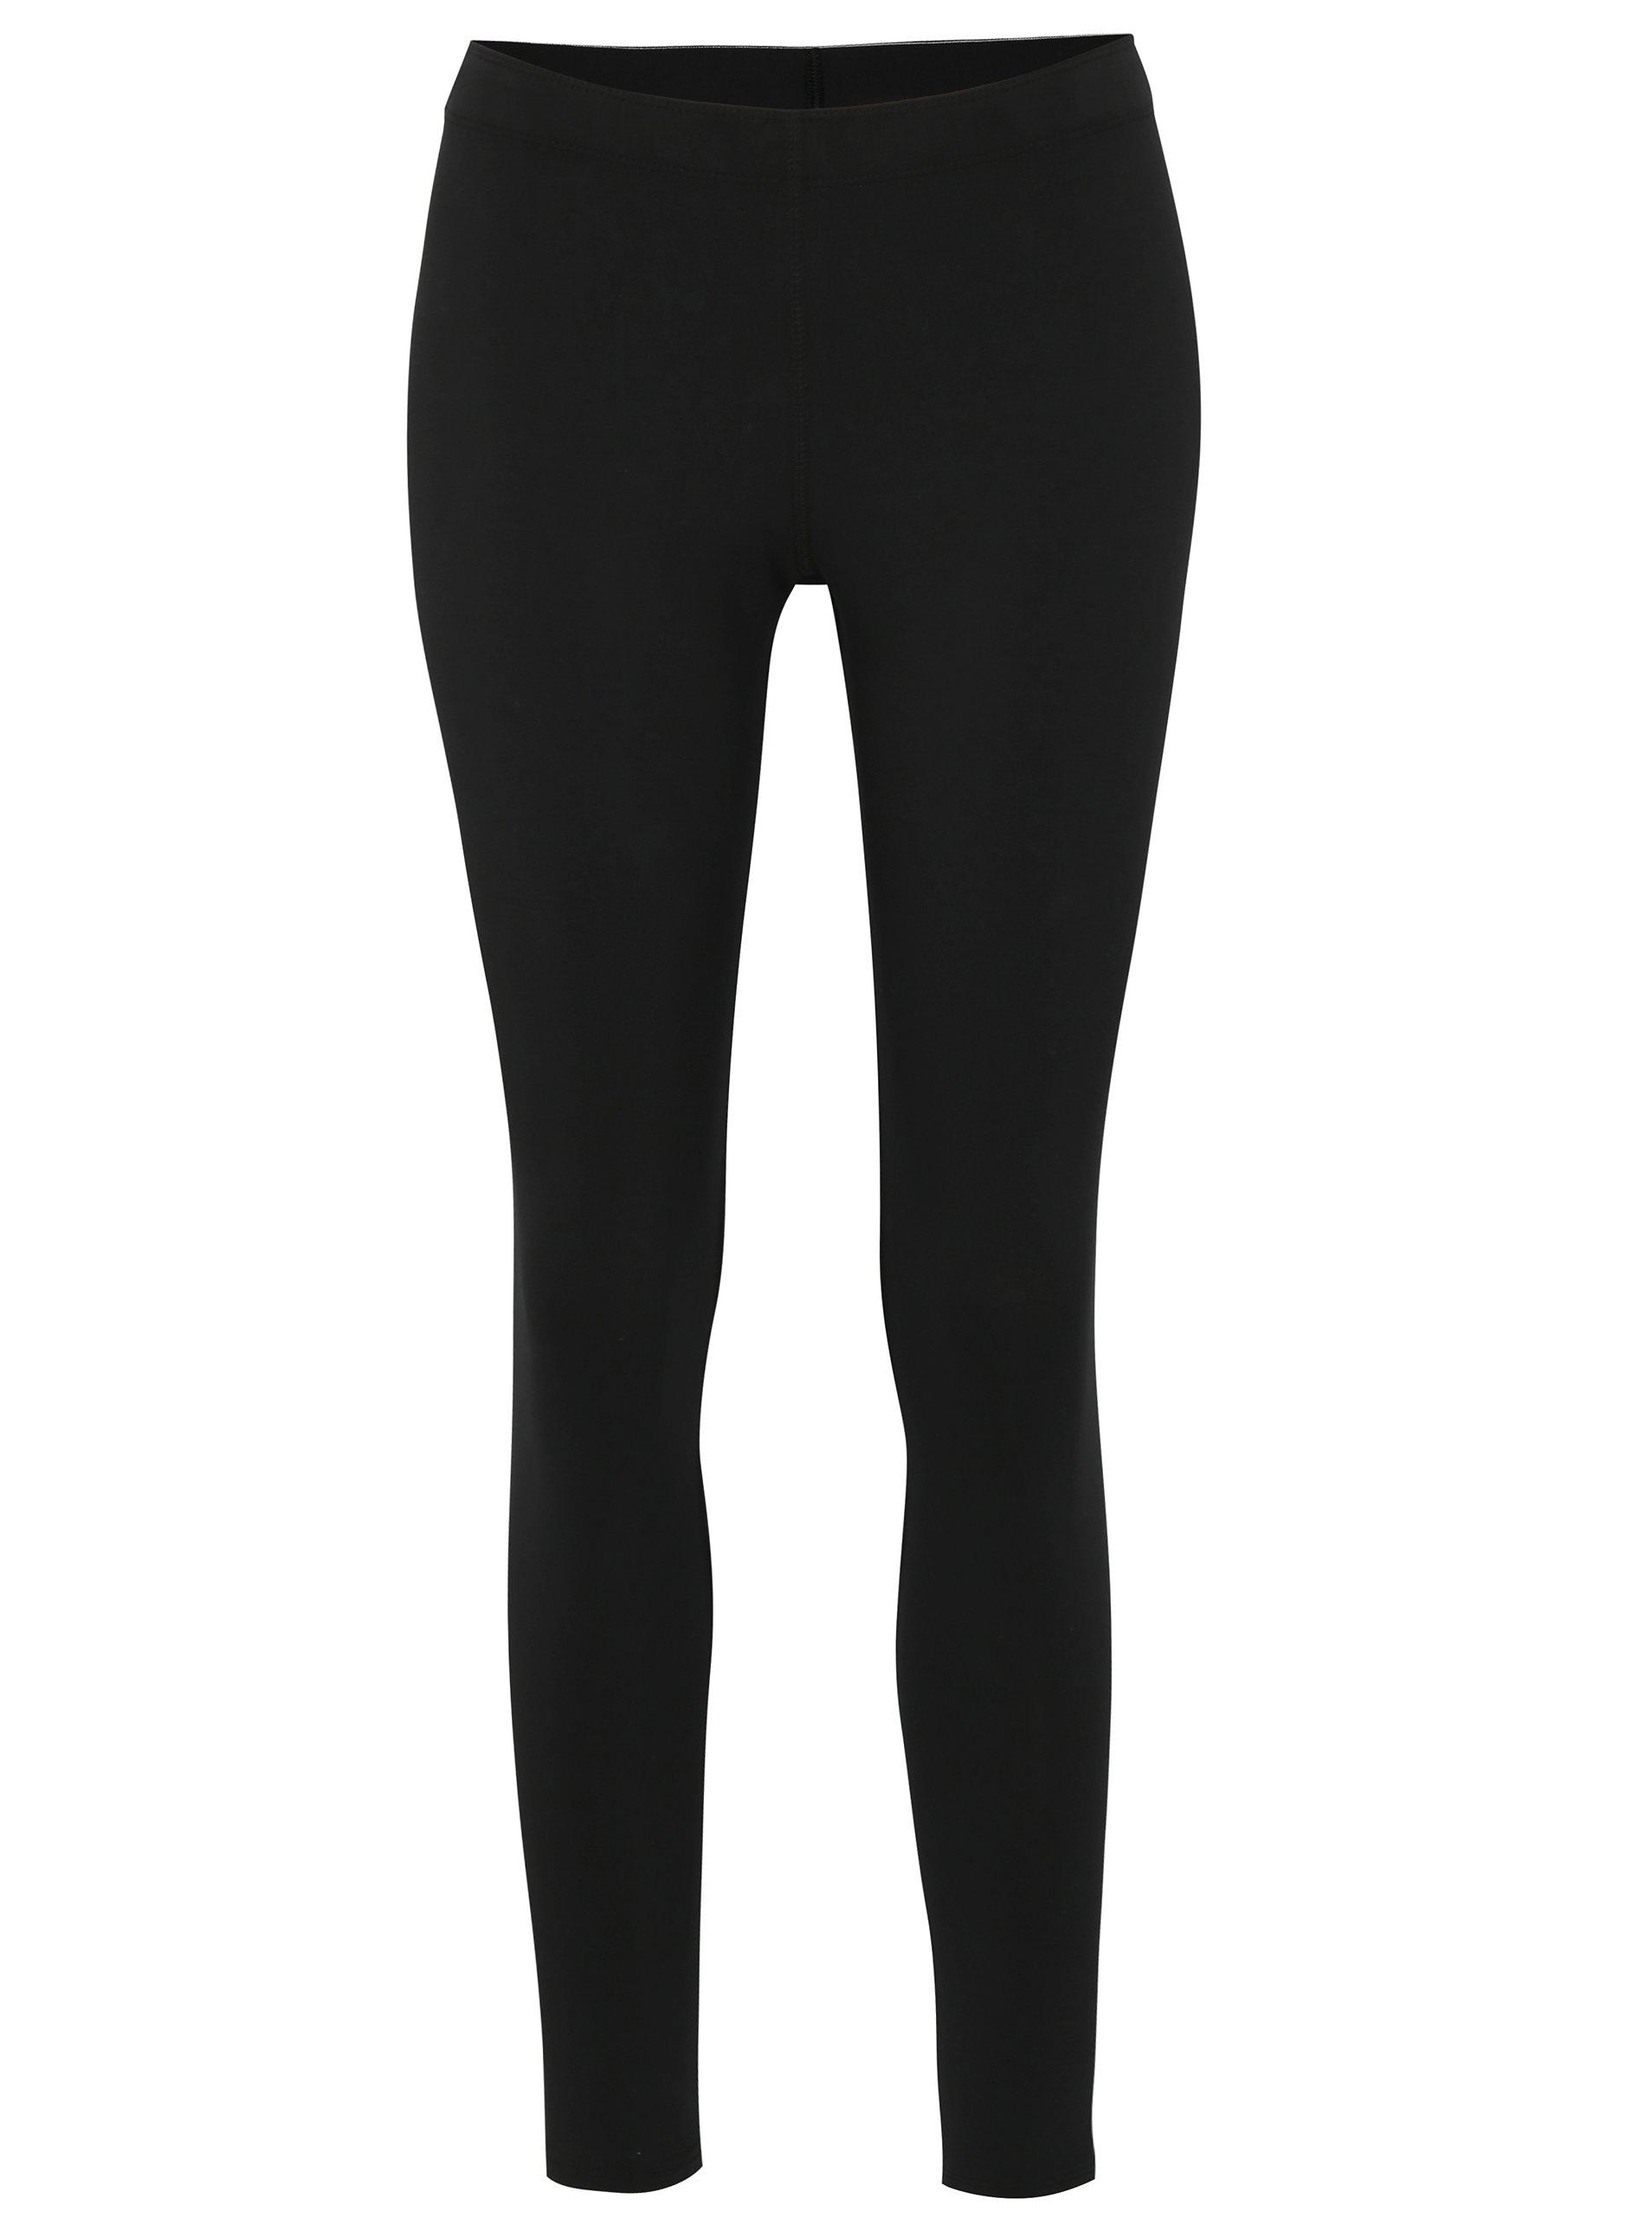 1f0752e3013e Čierne dámske legíny Nike Lggng logo ...